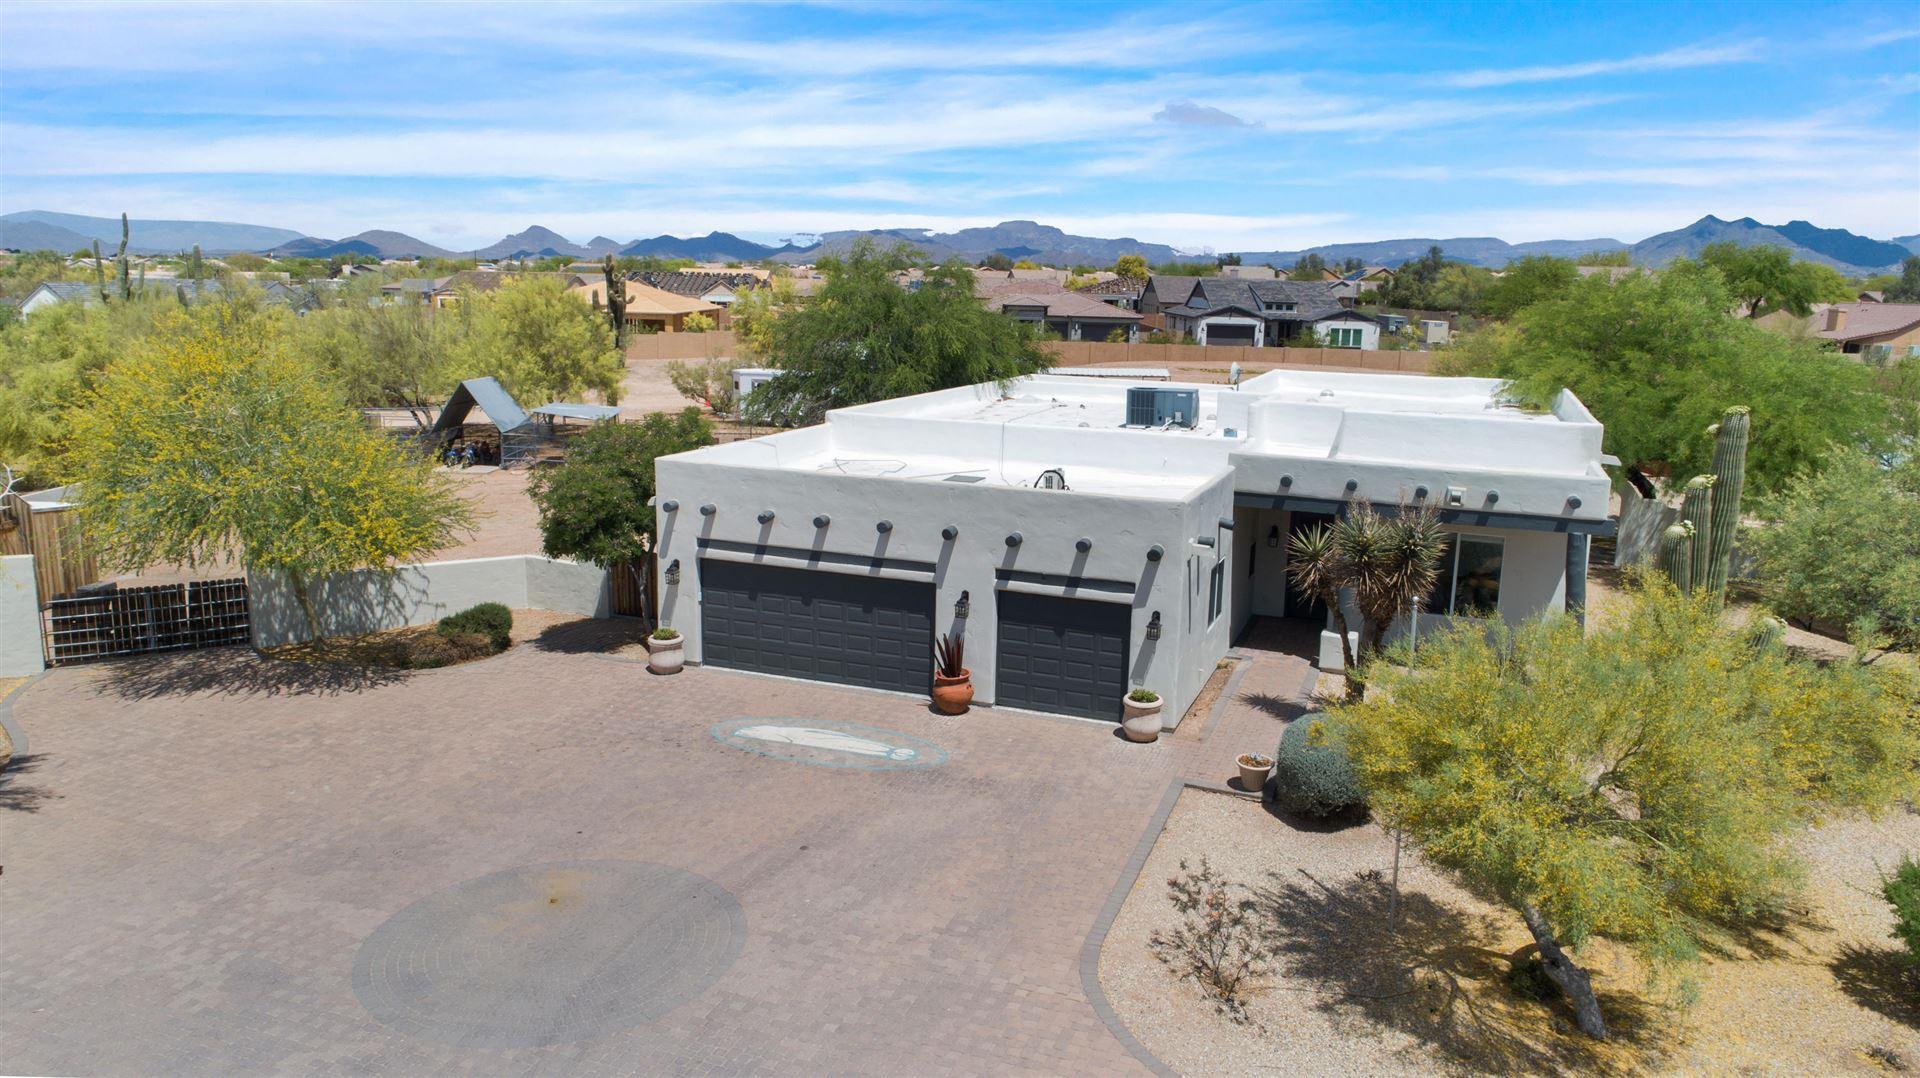 Photo of 28637 N 44TH Street, Cave Creek, AZ 85331 (MLS # 6227685)